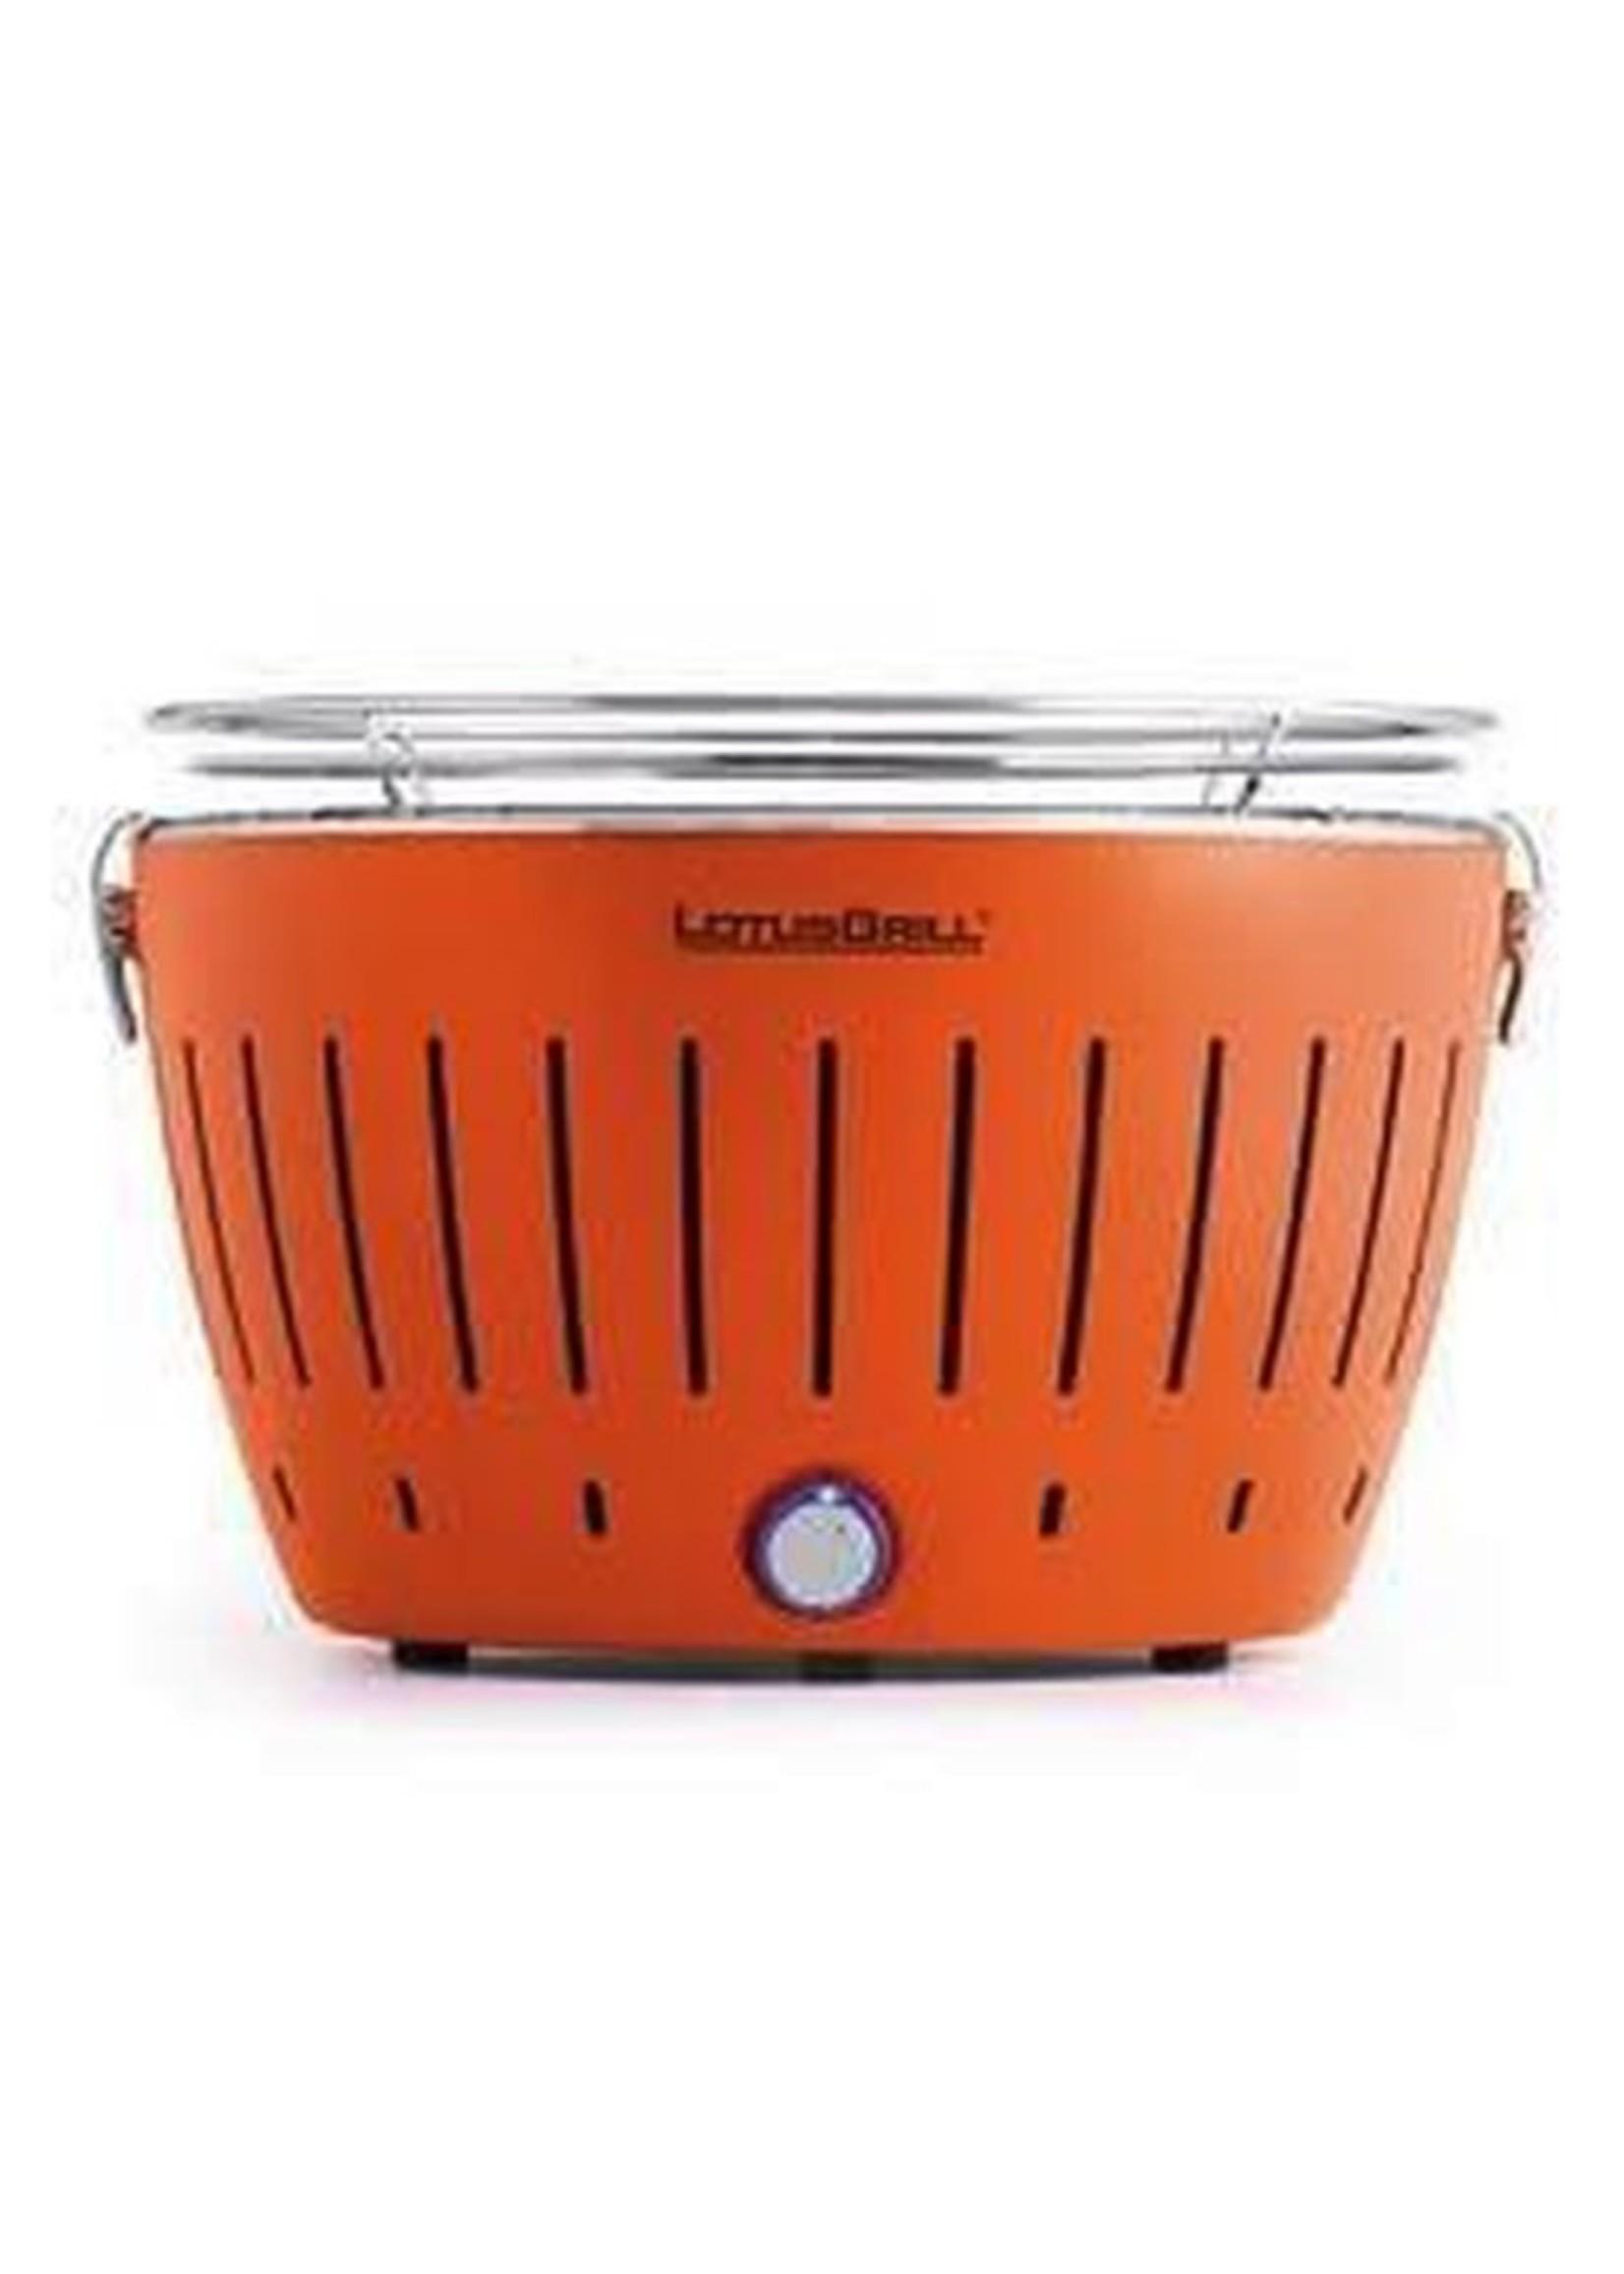 LotusGrill LotusGrill Classic Tafelbarbecue - Ø350 mm - Oranje